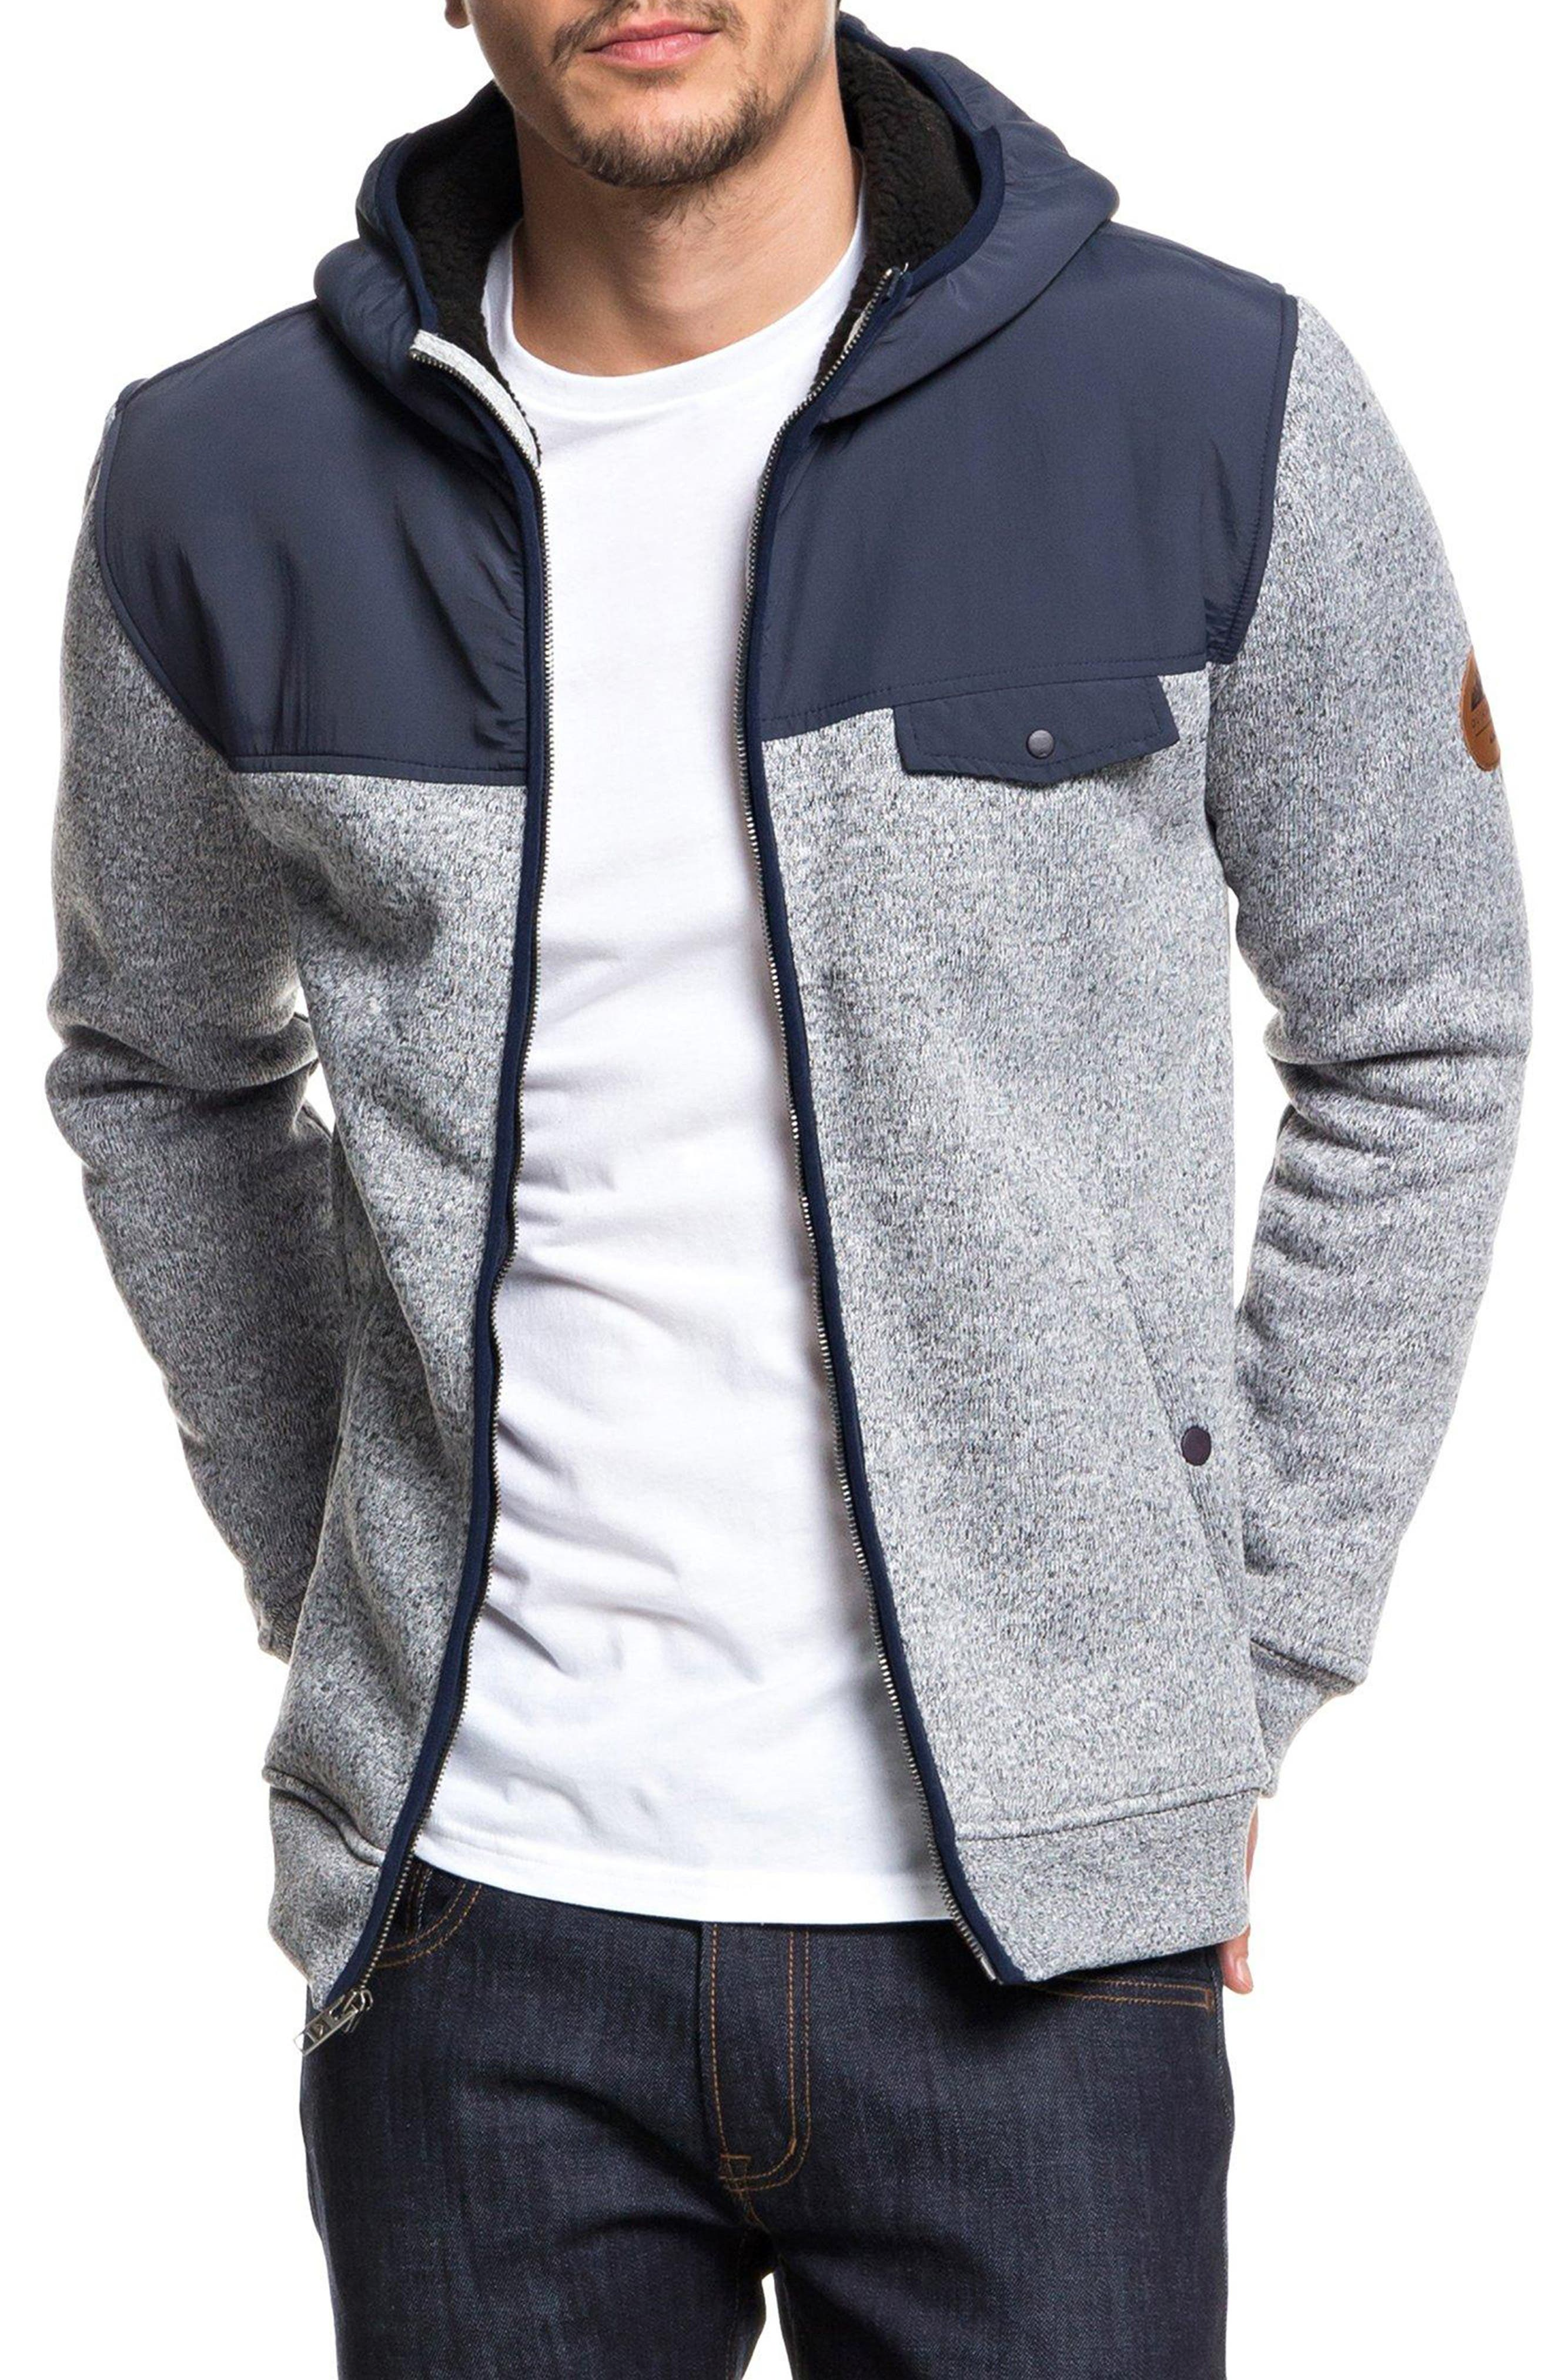 Keller Mix Hooded Jacket,                             Main thumbnail 1, color,                             401